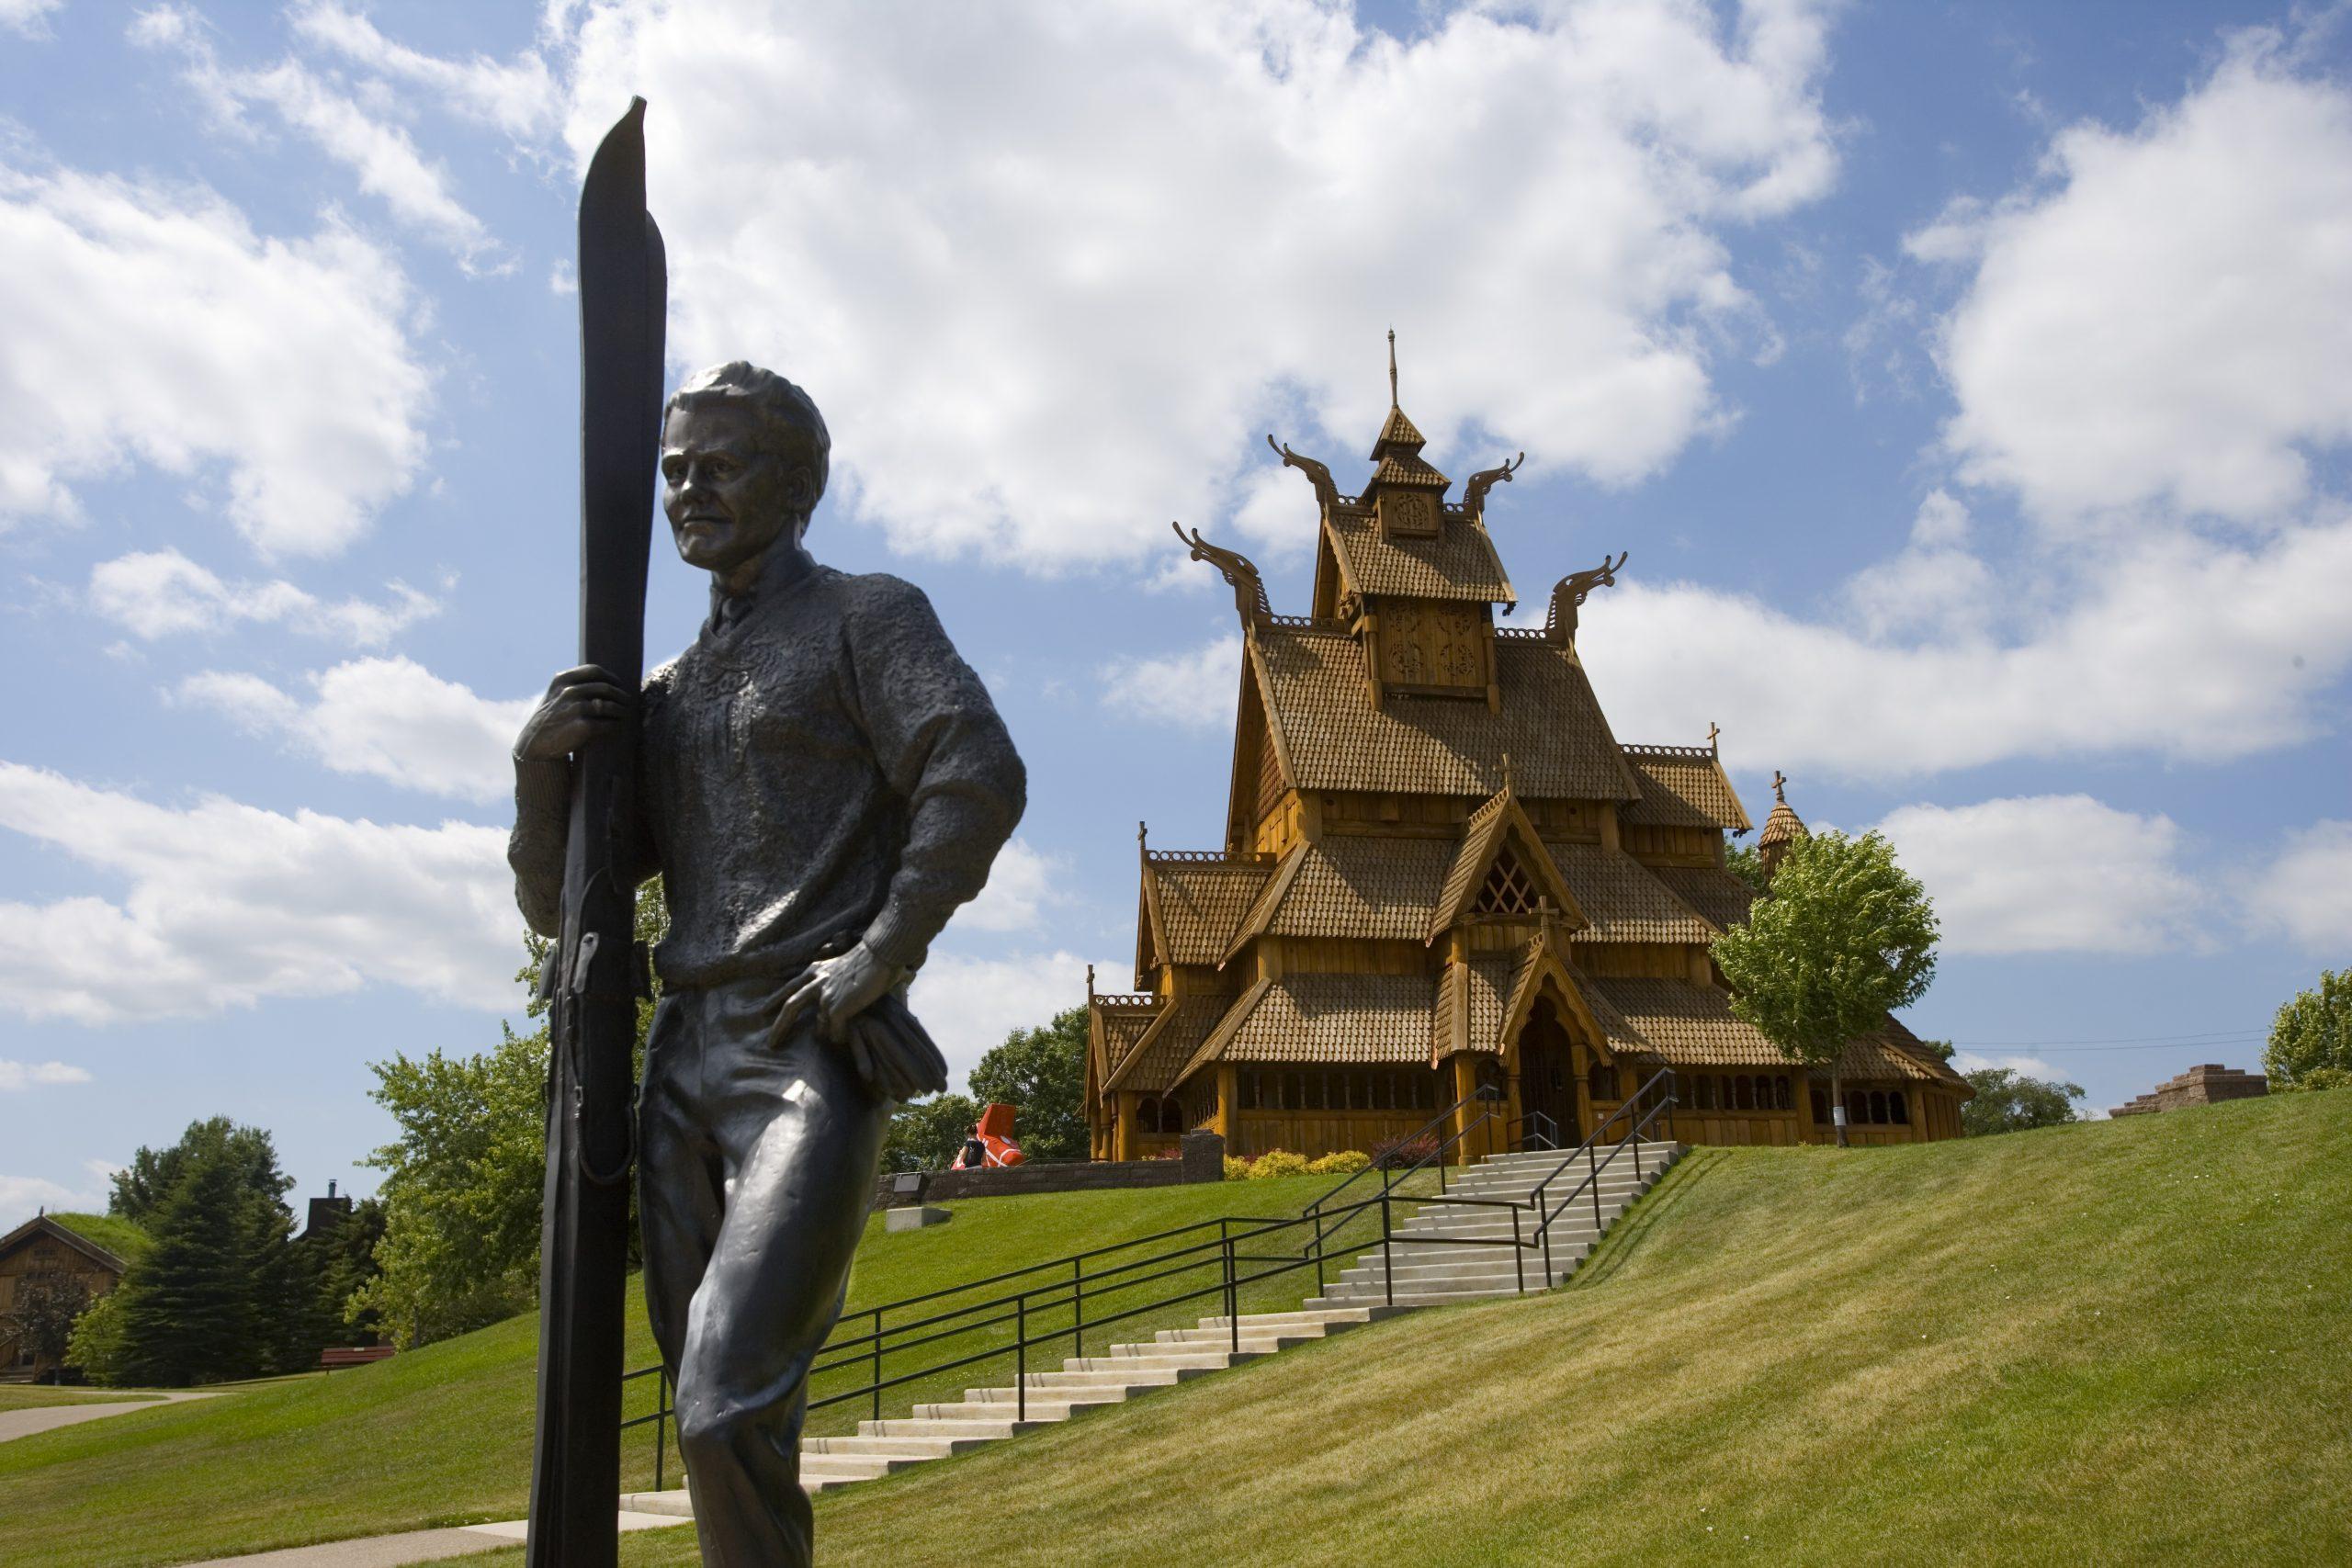 Scandinavian Heritage Park Gol Stav Church and Statue